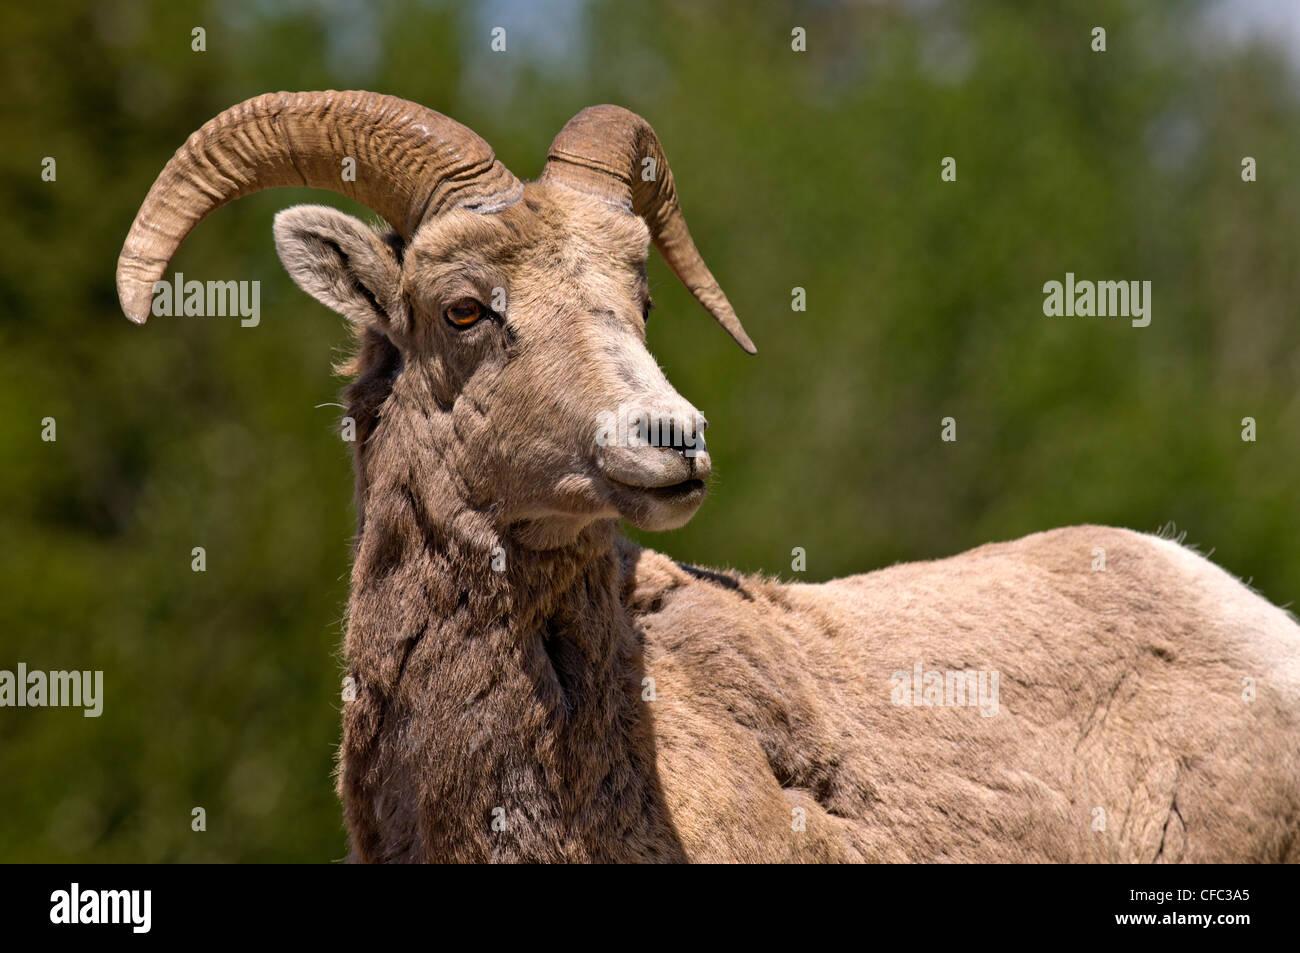 Big Horn Sheep (Ovis canadensis), Jasper National Park, Alberta, Canada - Stock Image